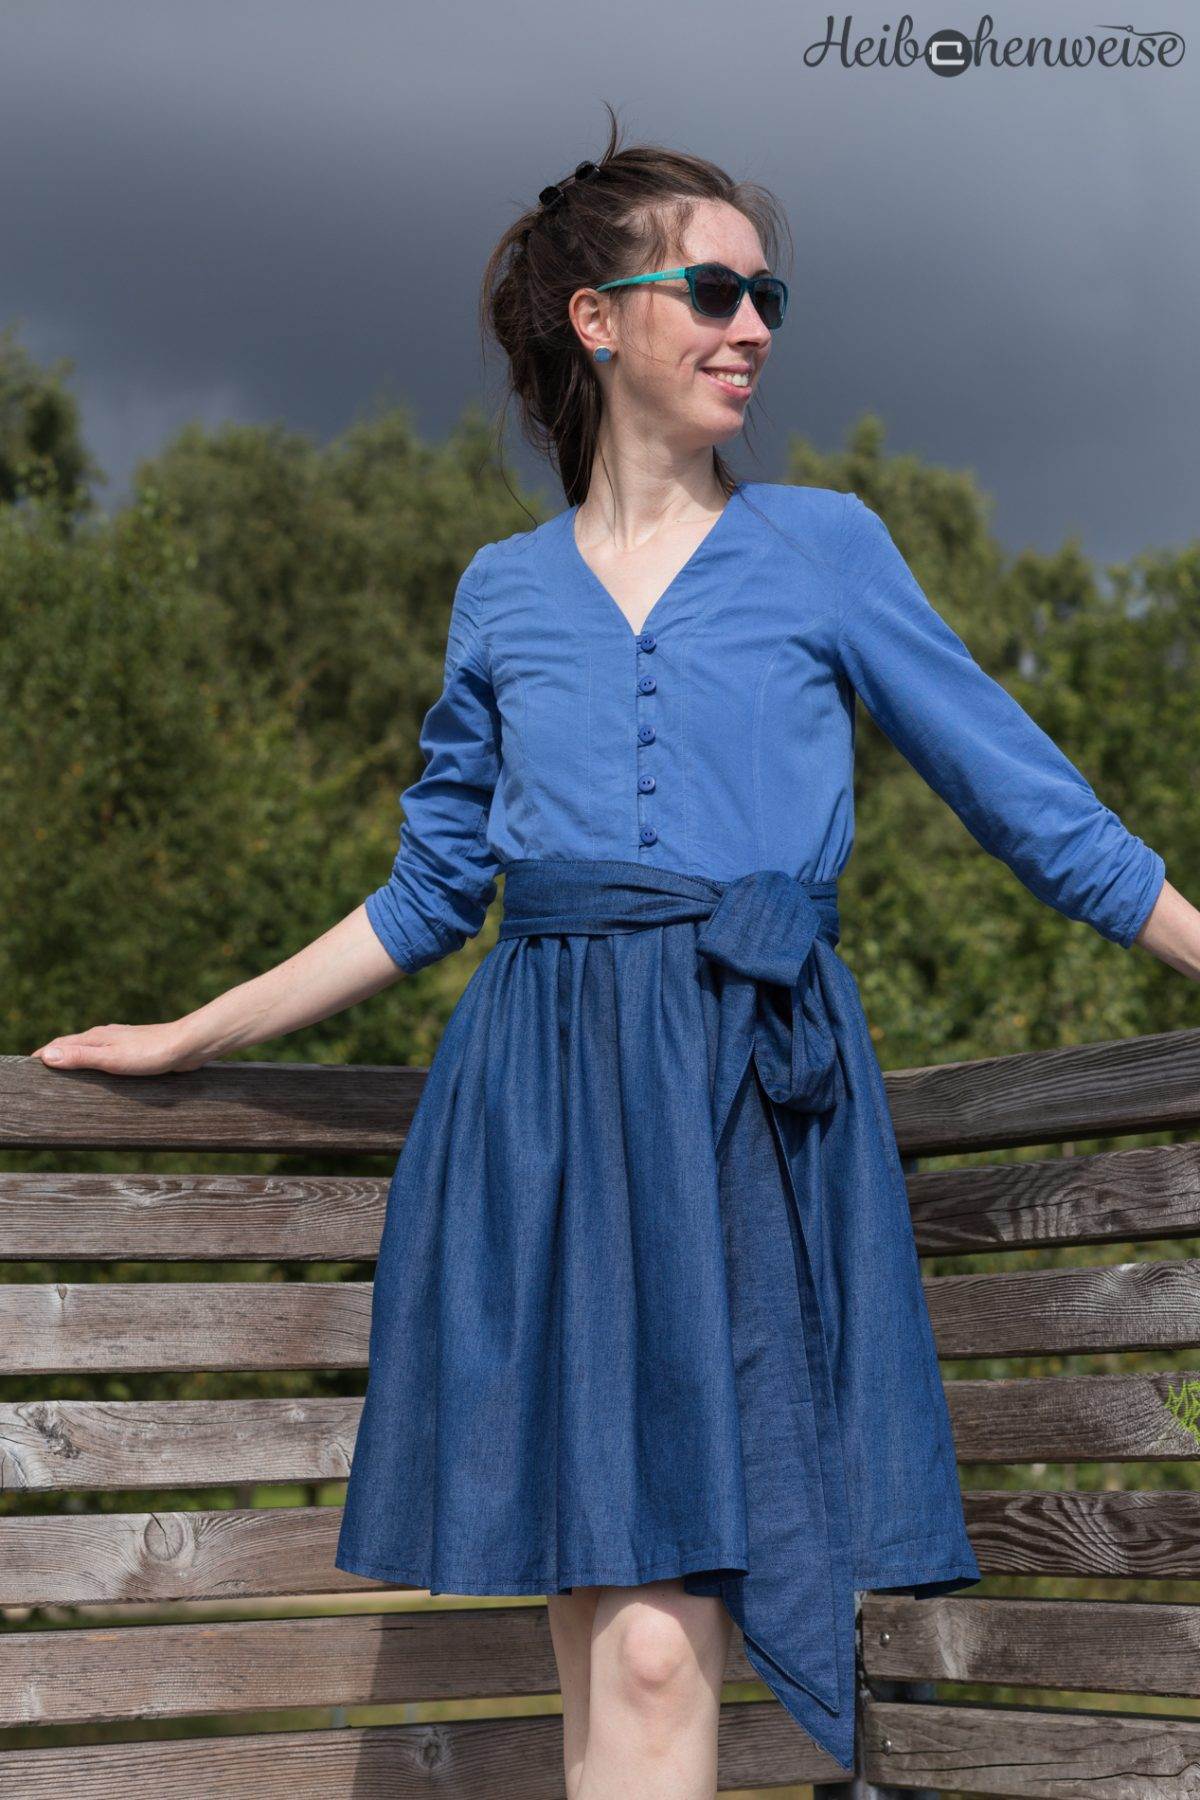 Noch mal: Irenes Kleid